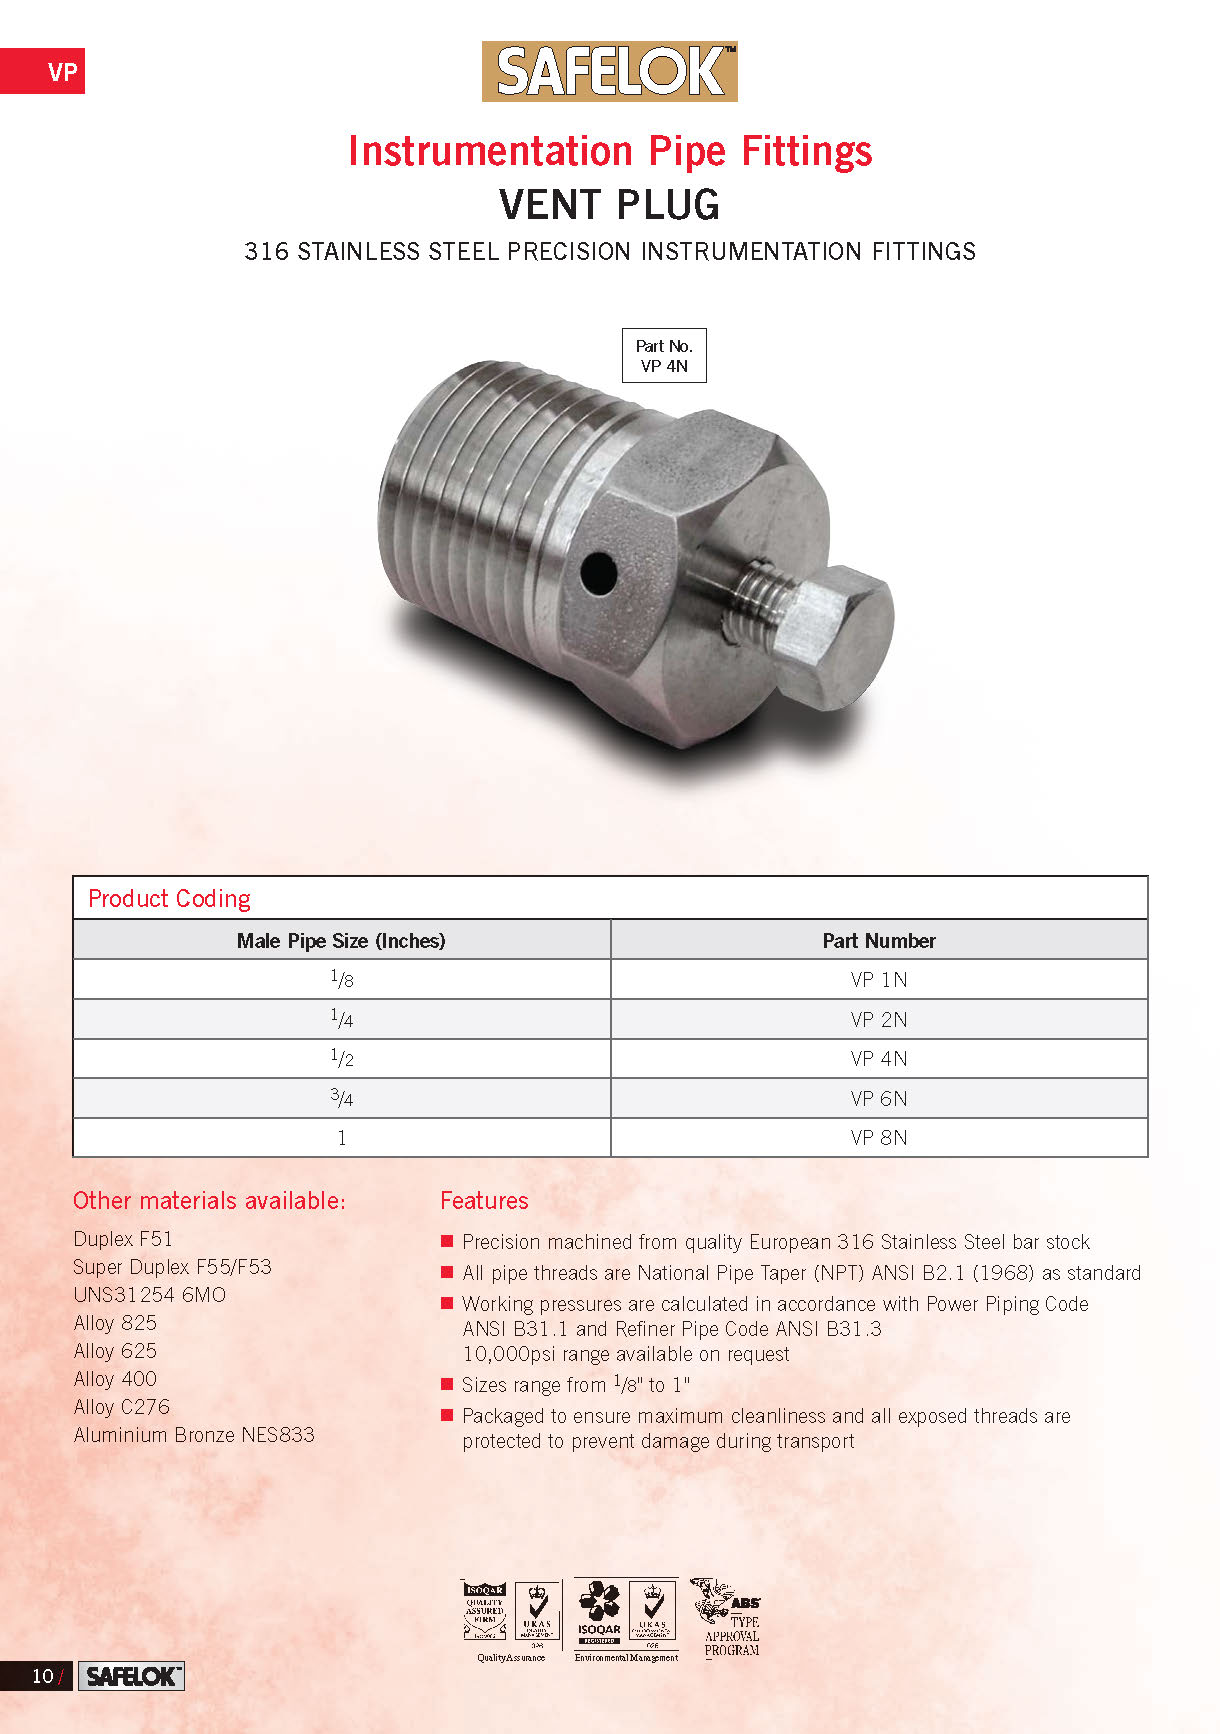 Instrumentation pipe fittings safelok